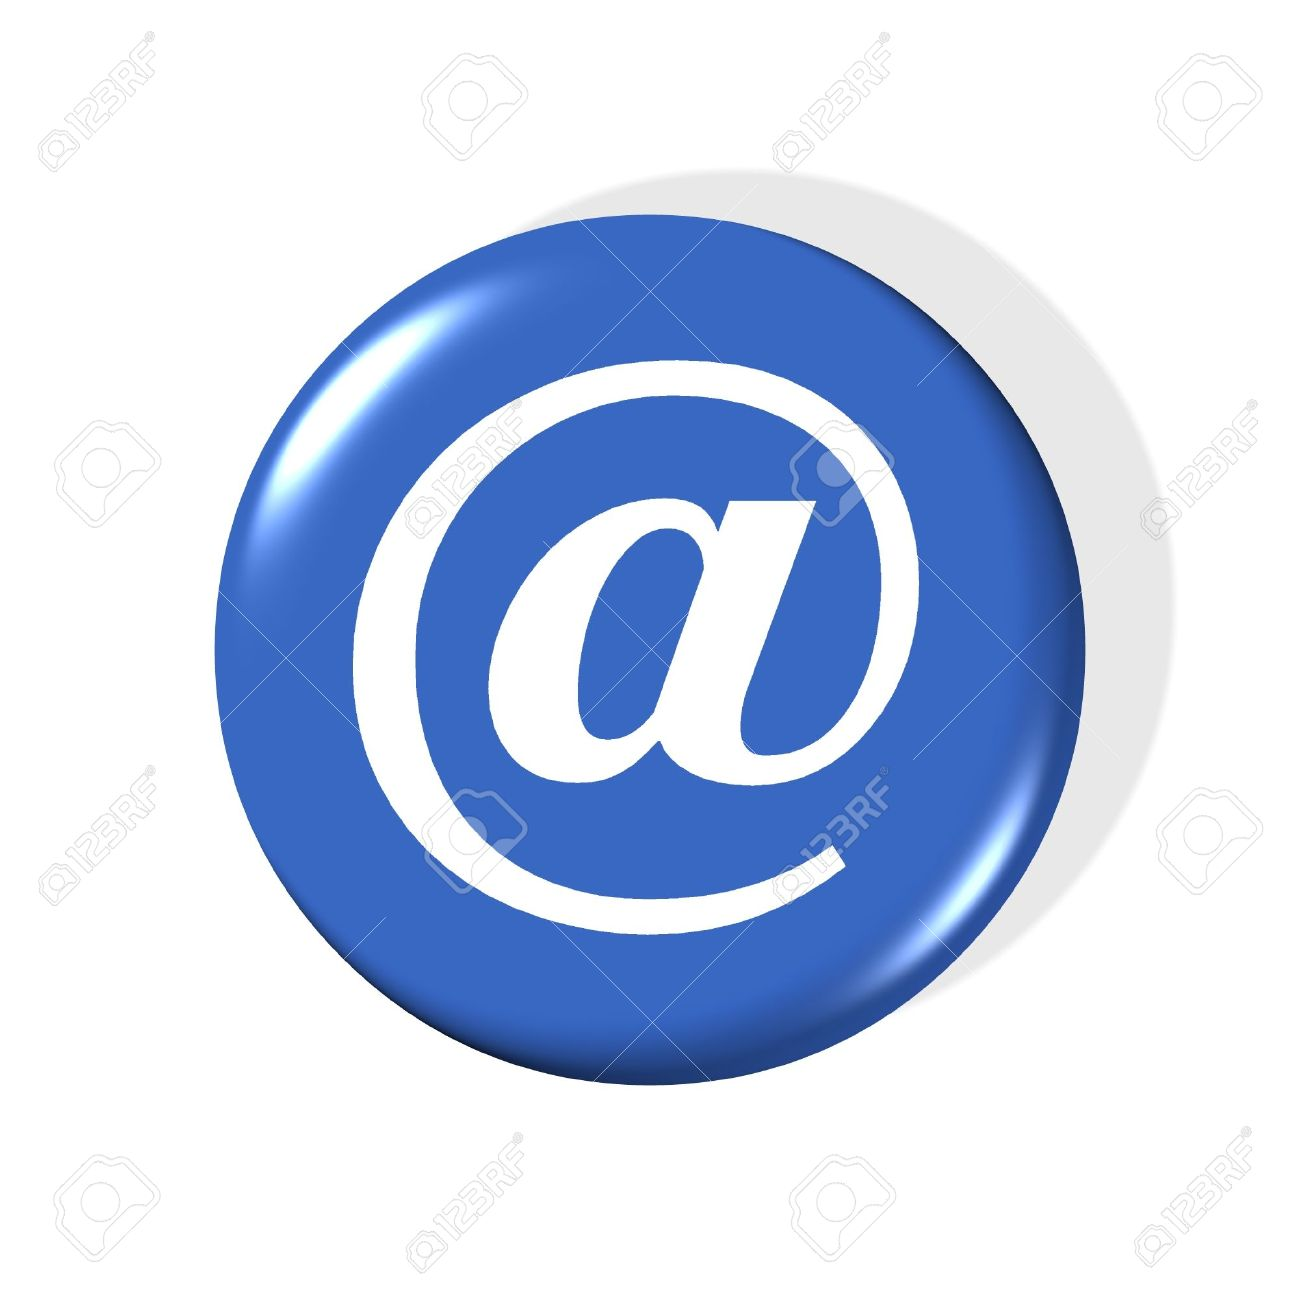 Resultado de imagen de simbolo de correo electronico